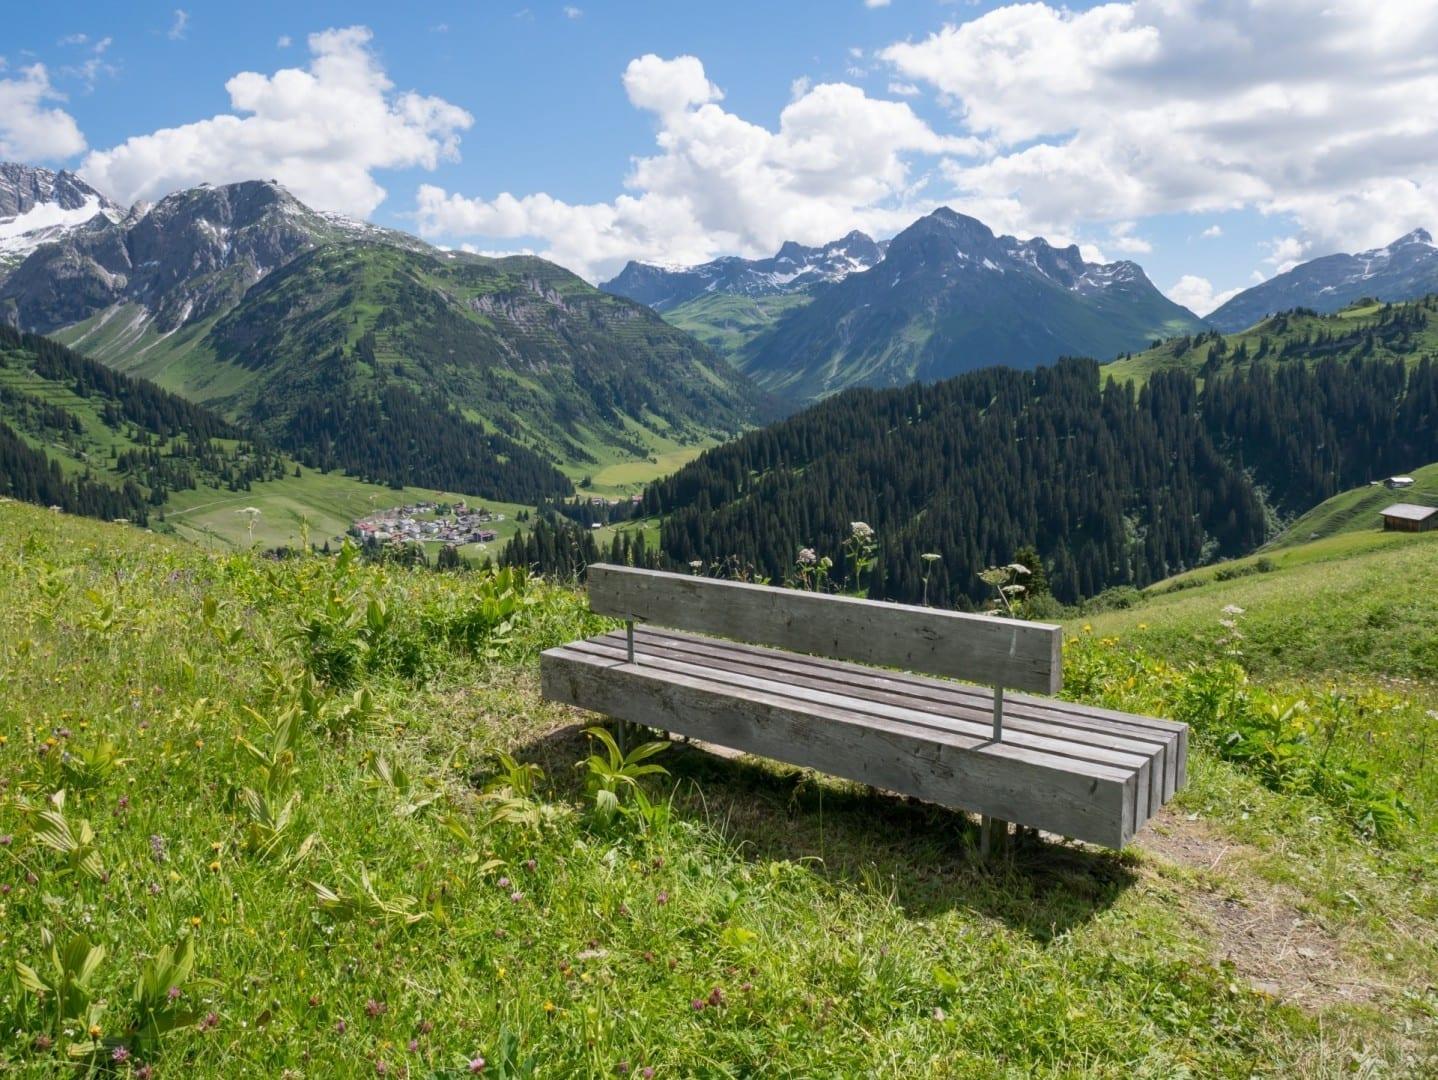 Banco en un sendero de excursión por encima de Lech Lech am Arlberg Austria